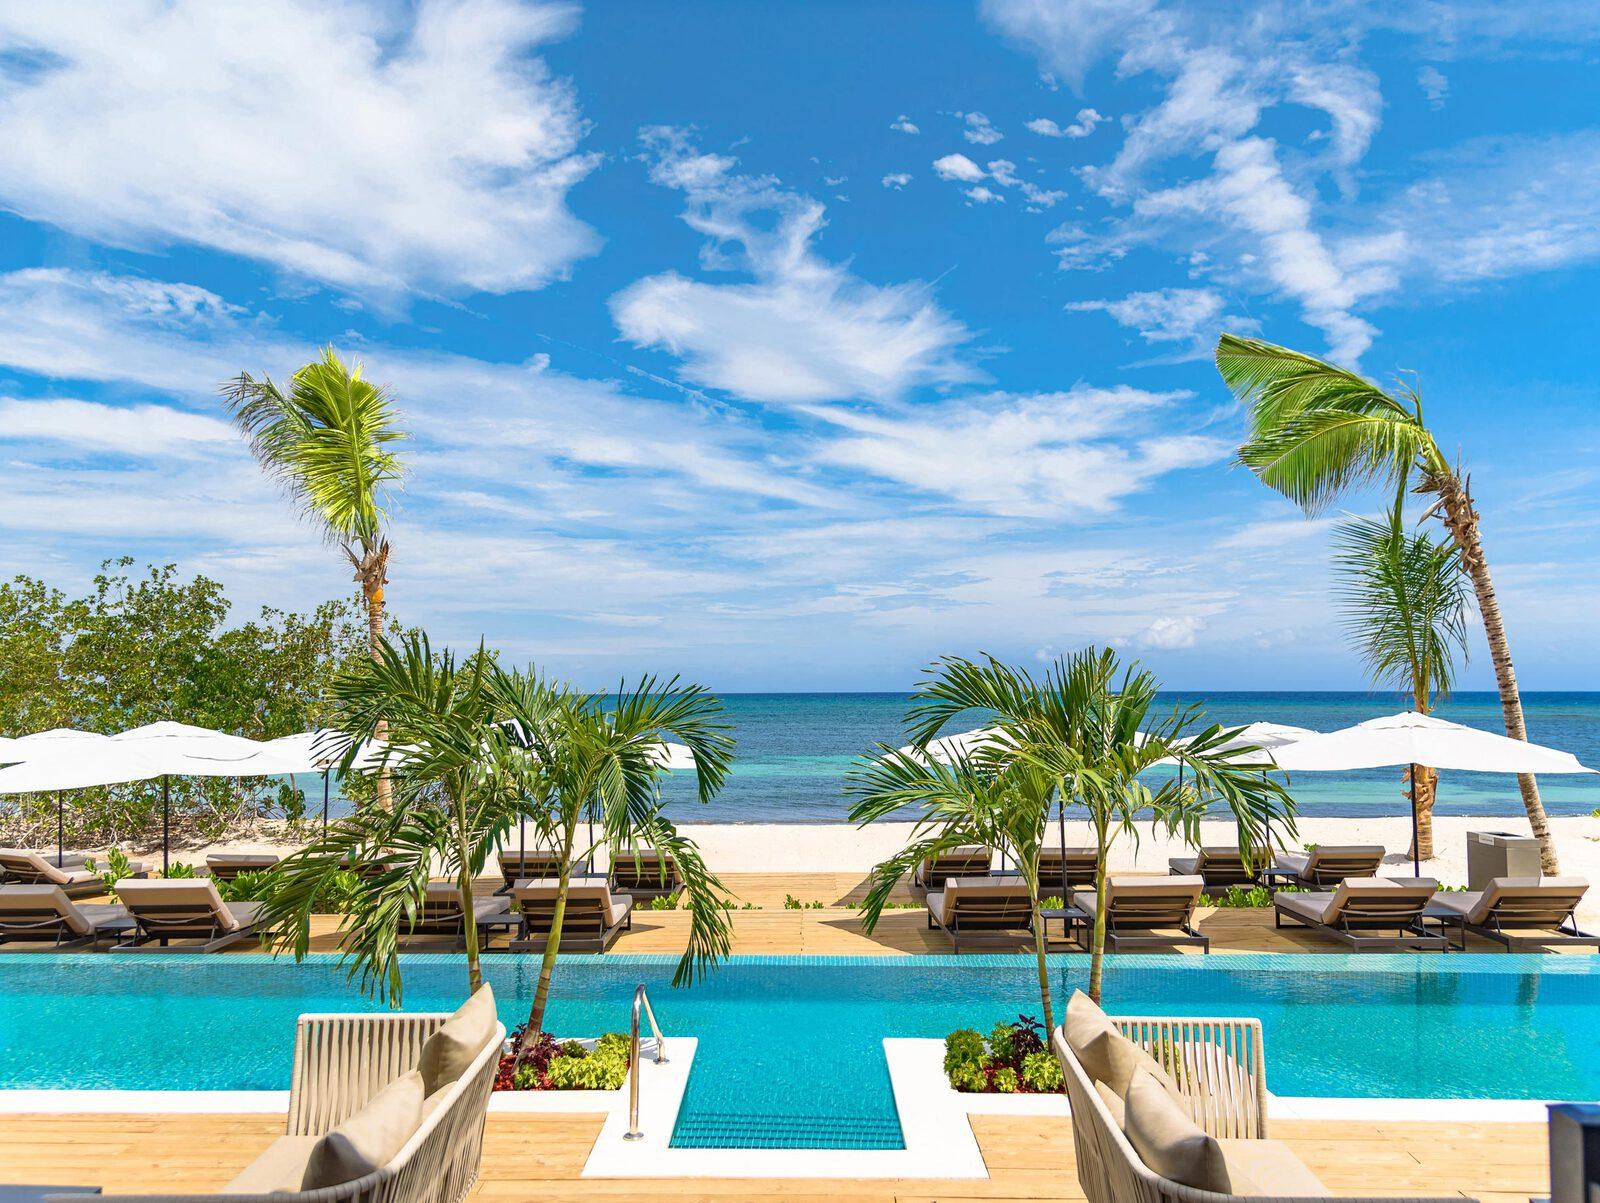 luxury-resorts-in-montego-bay-jamaica